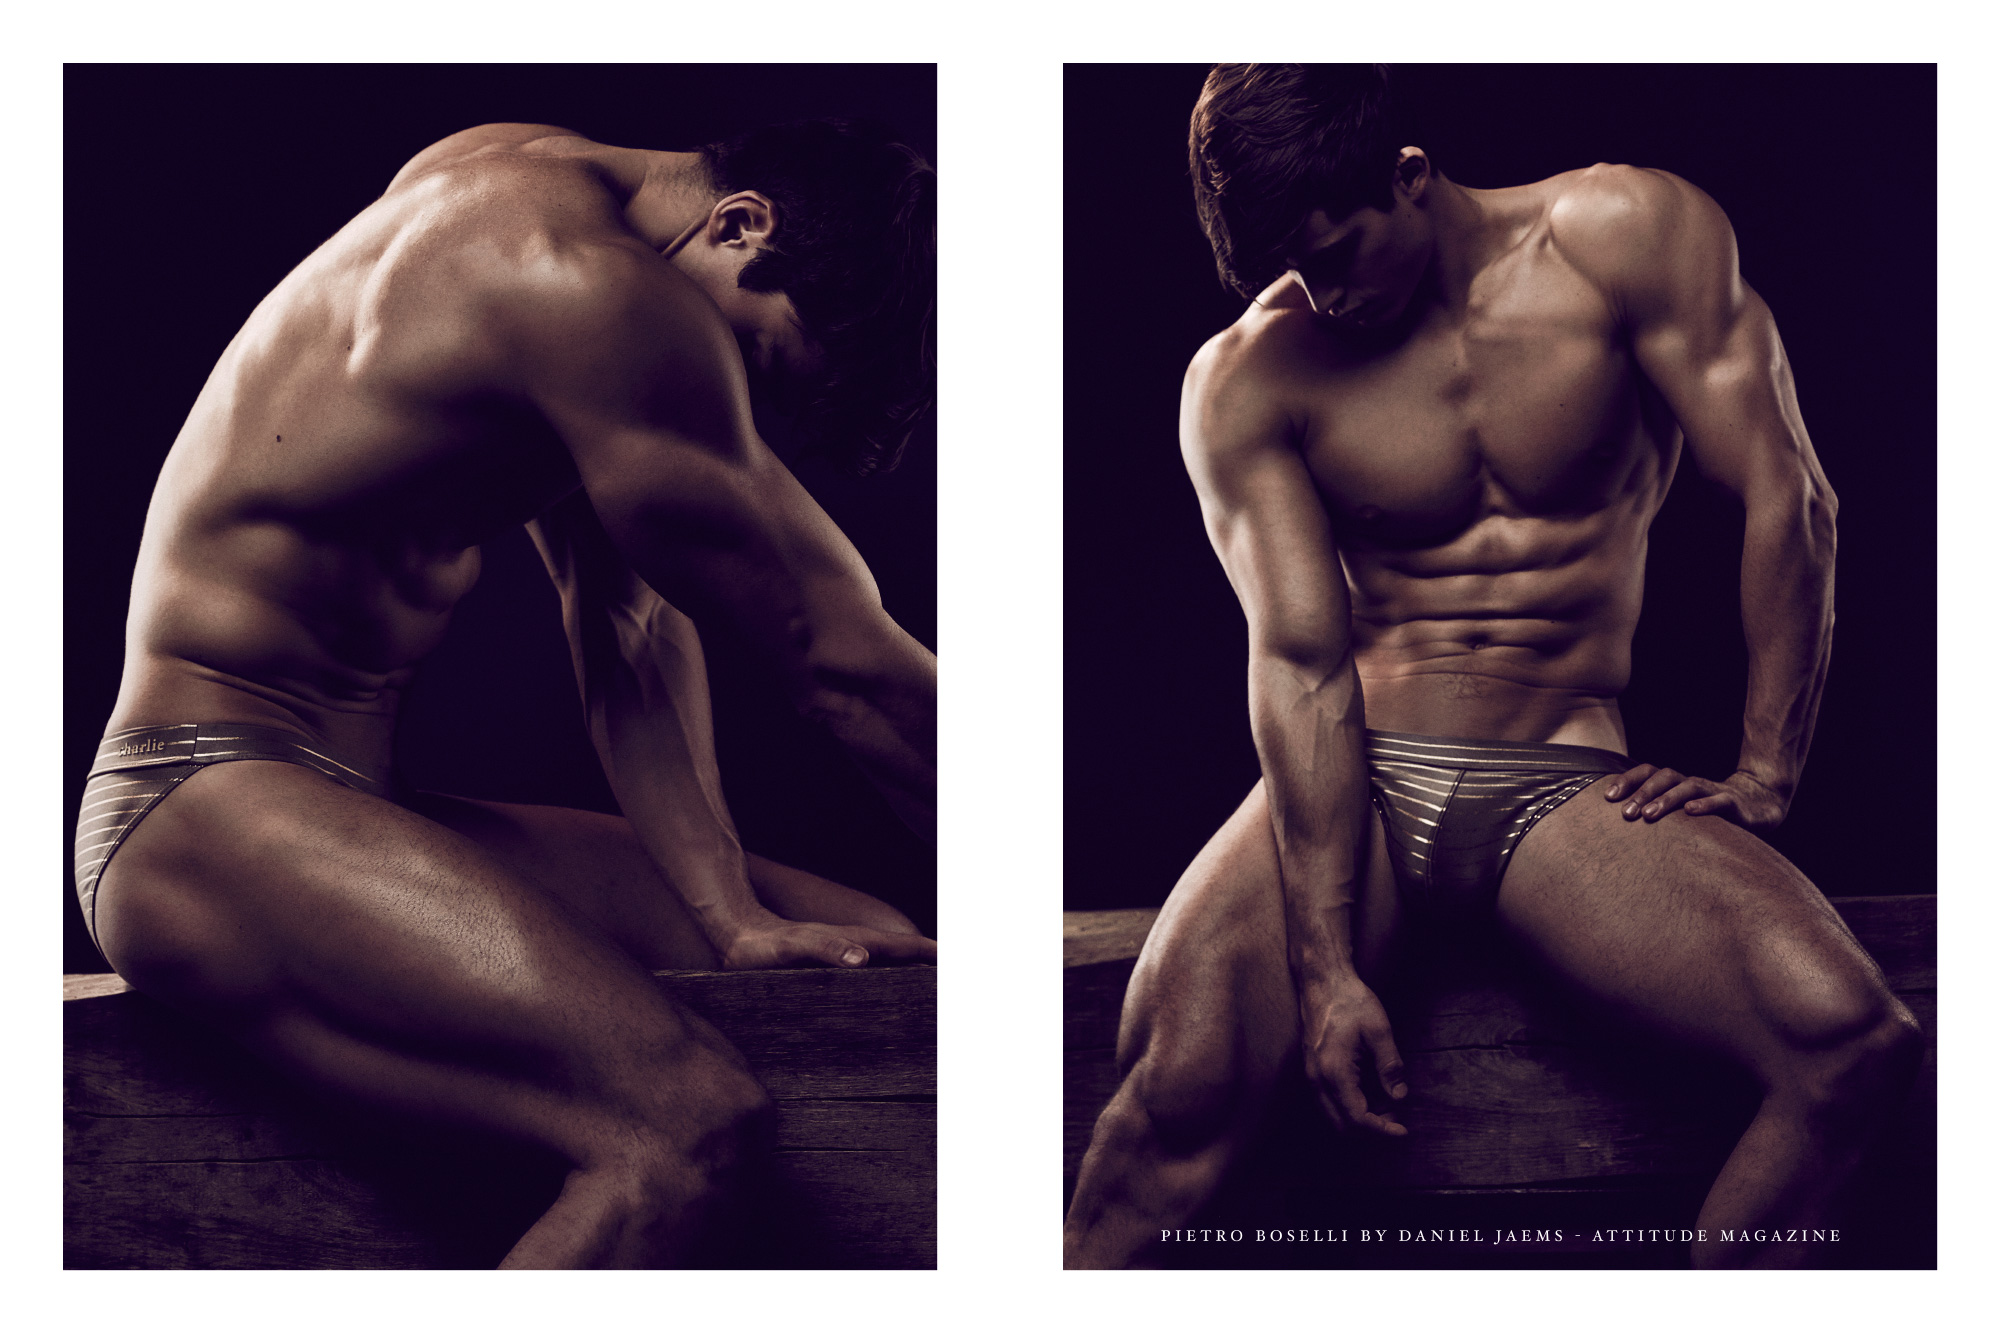 Pietro-Boselli-by-Daniel-Jaems-for-Attitude-Magazine-09